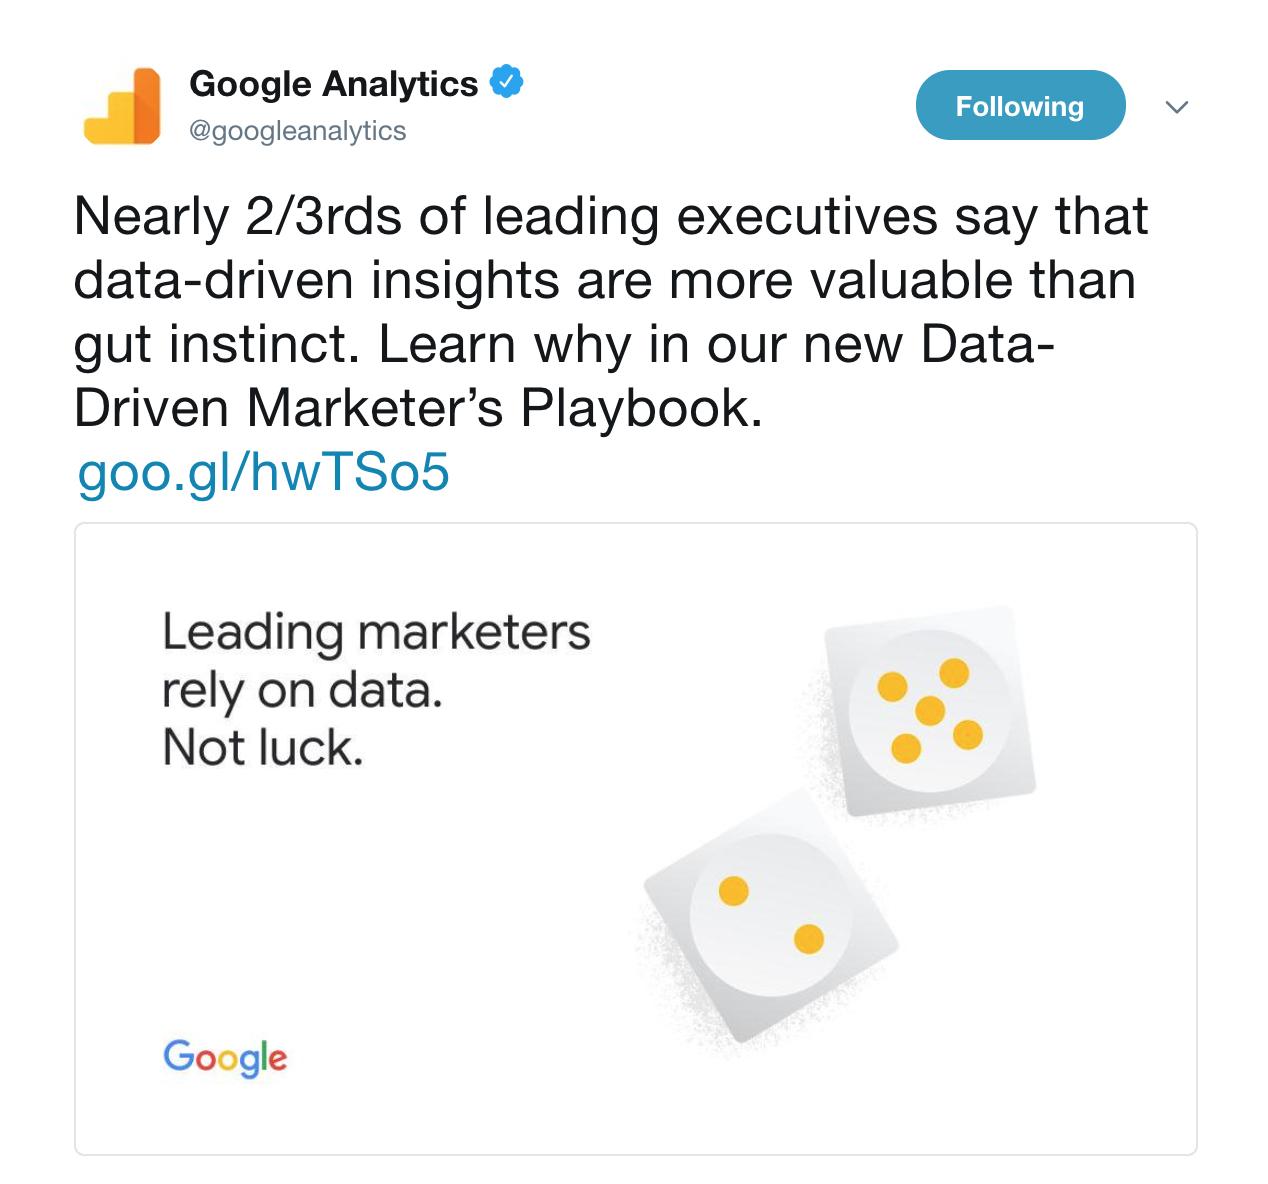 google-analytics-tweet-4.jpg